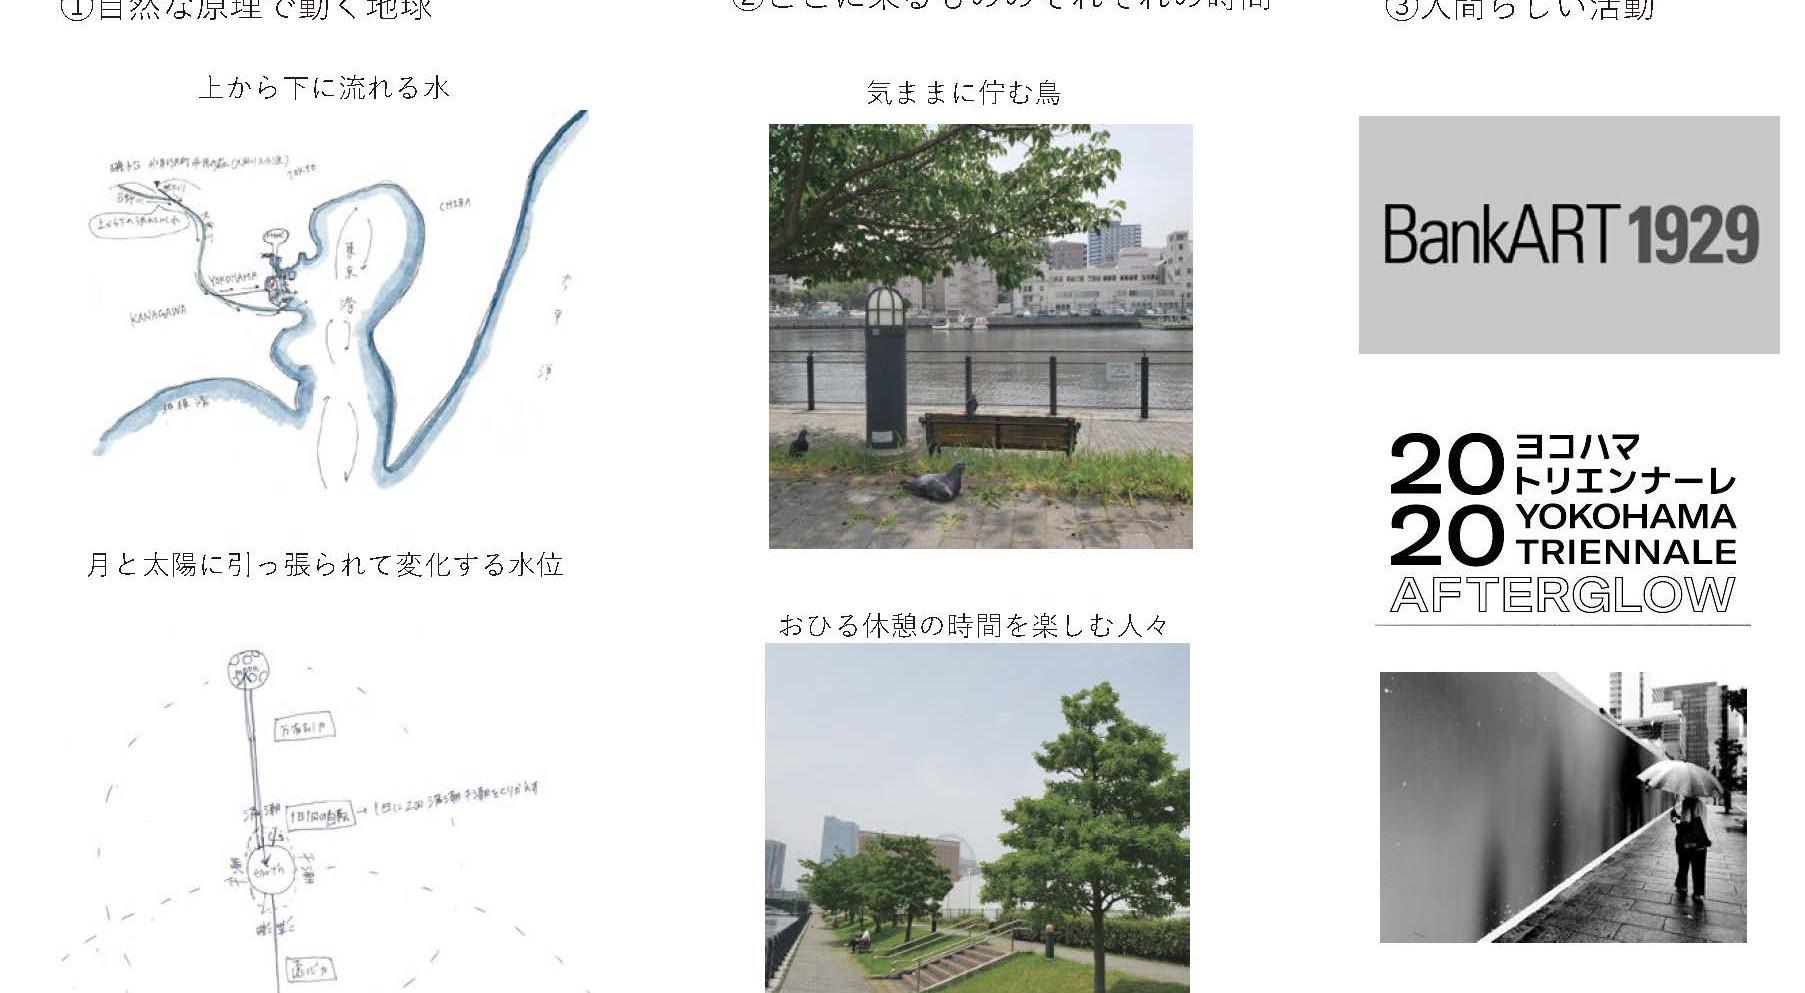 建築展WEB水辺_ページ_06.jpg